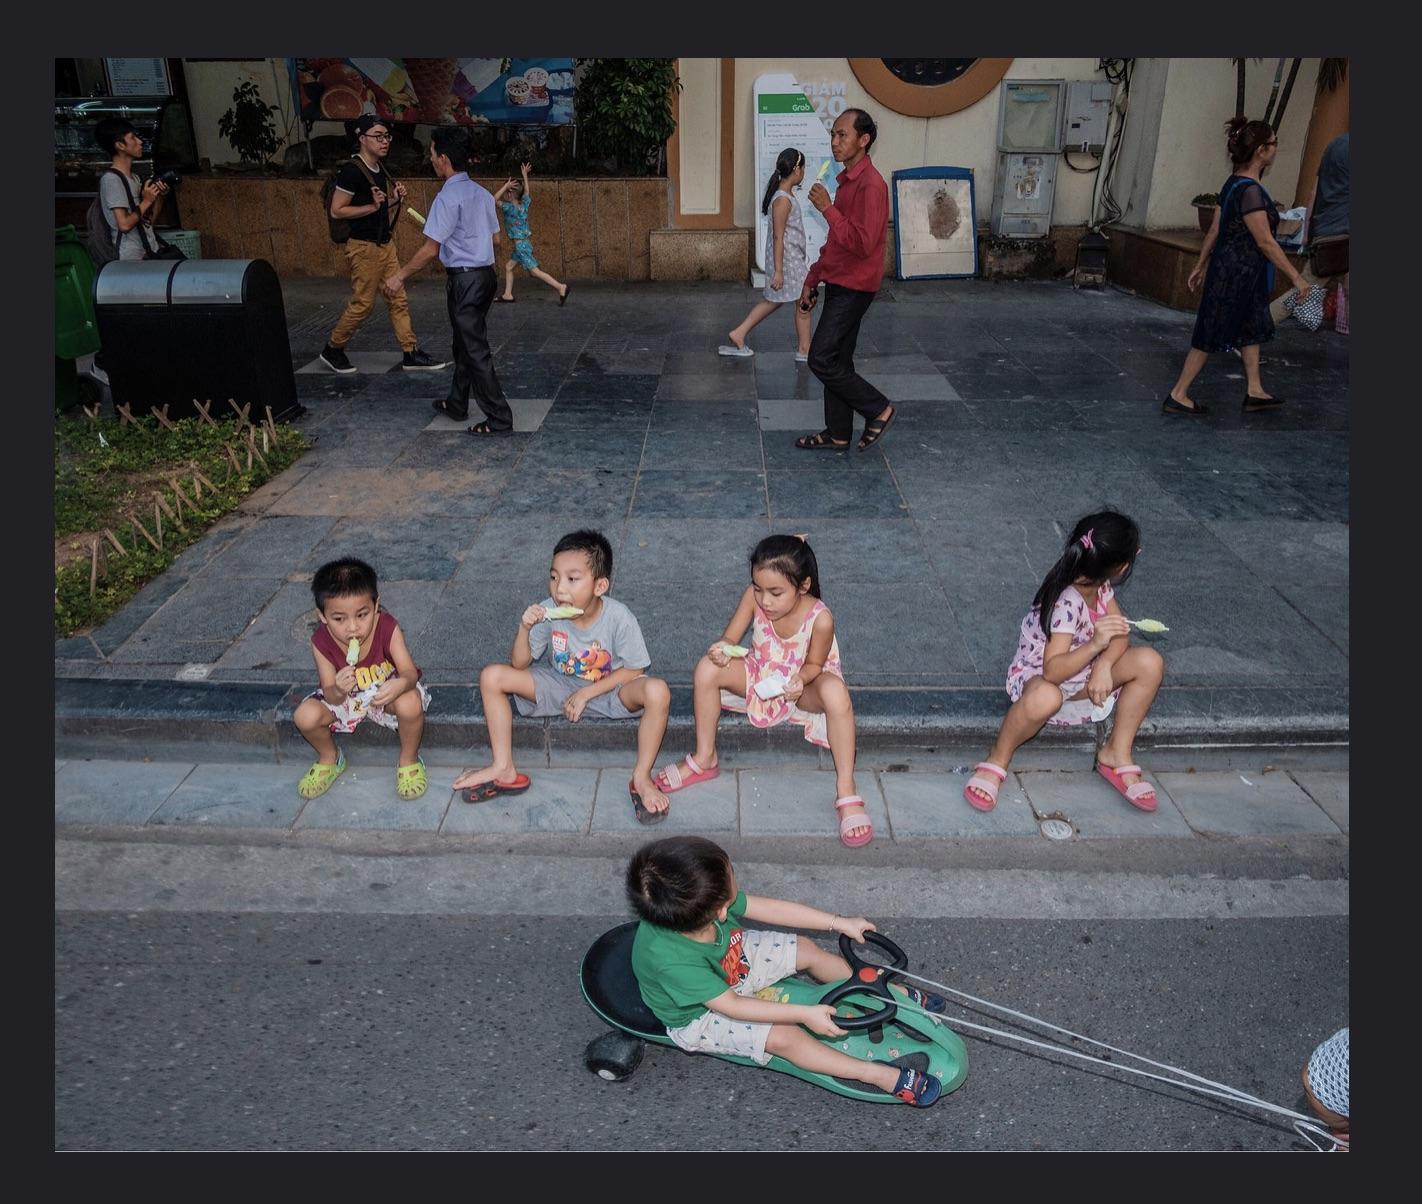 chu viet ha street photography 4-resized